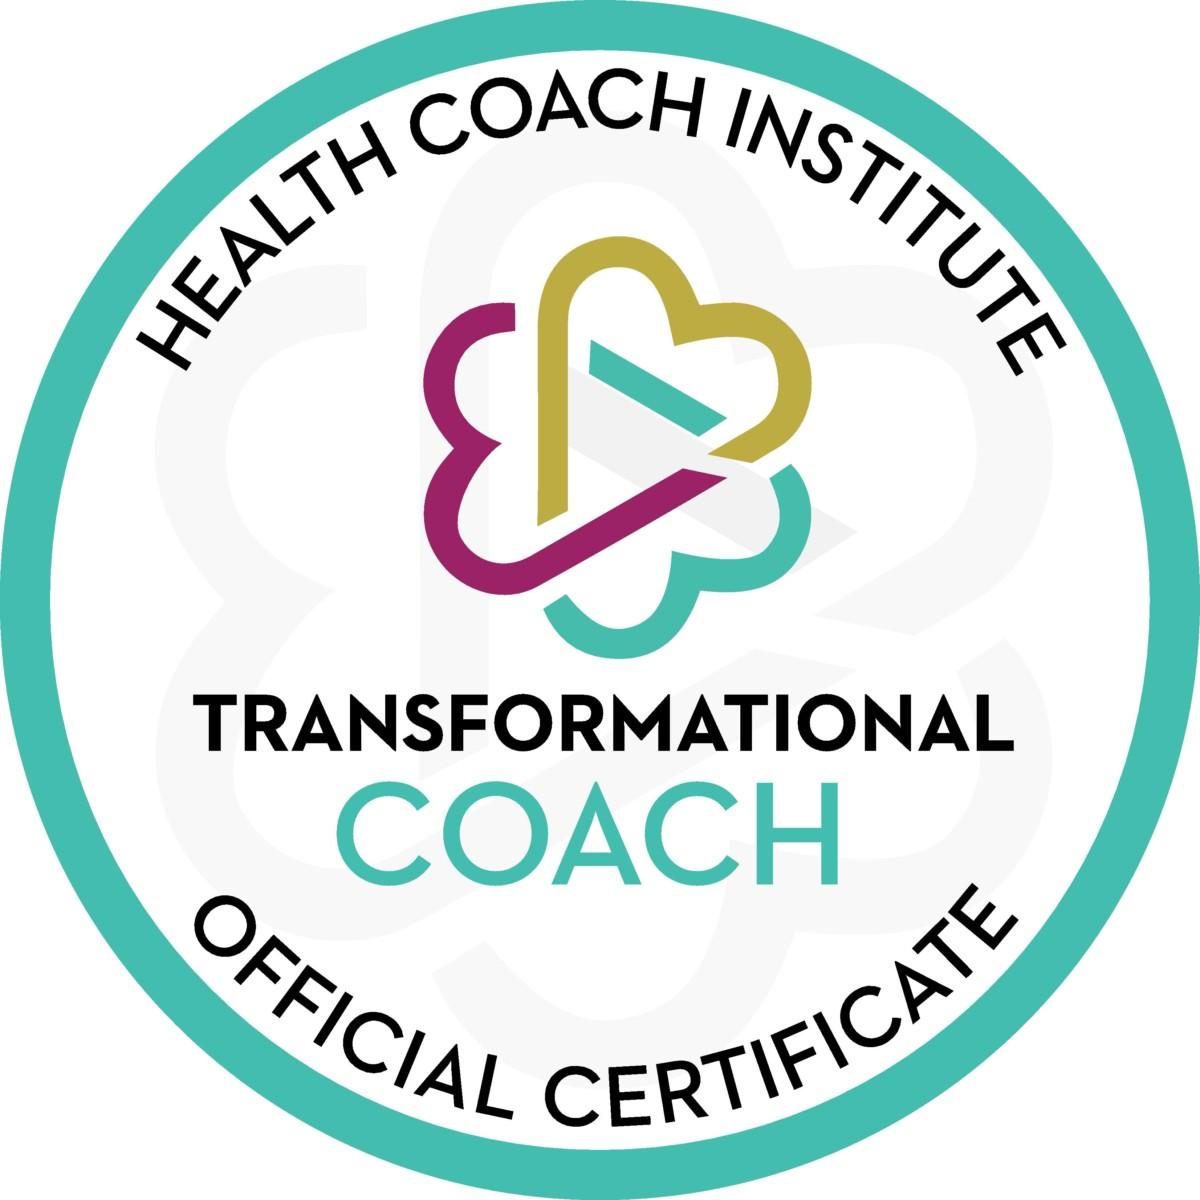 Sertifisert transformational coach